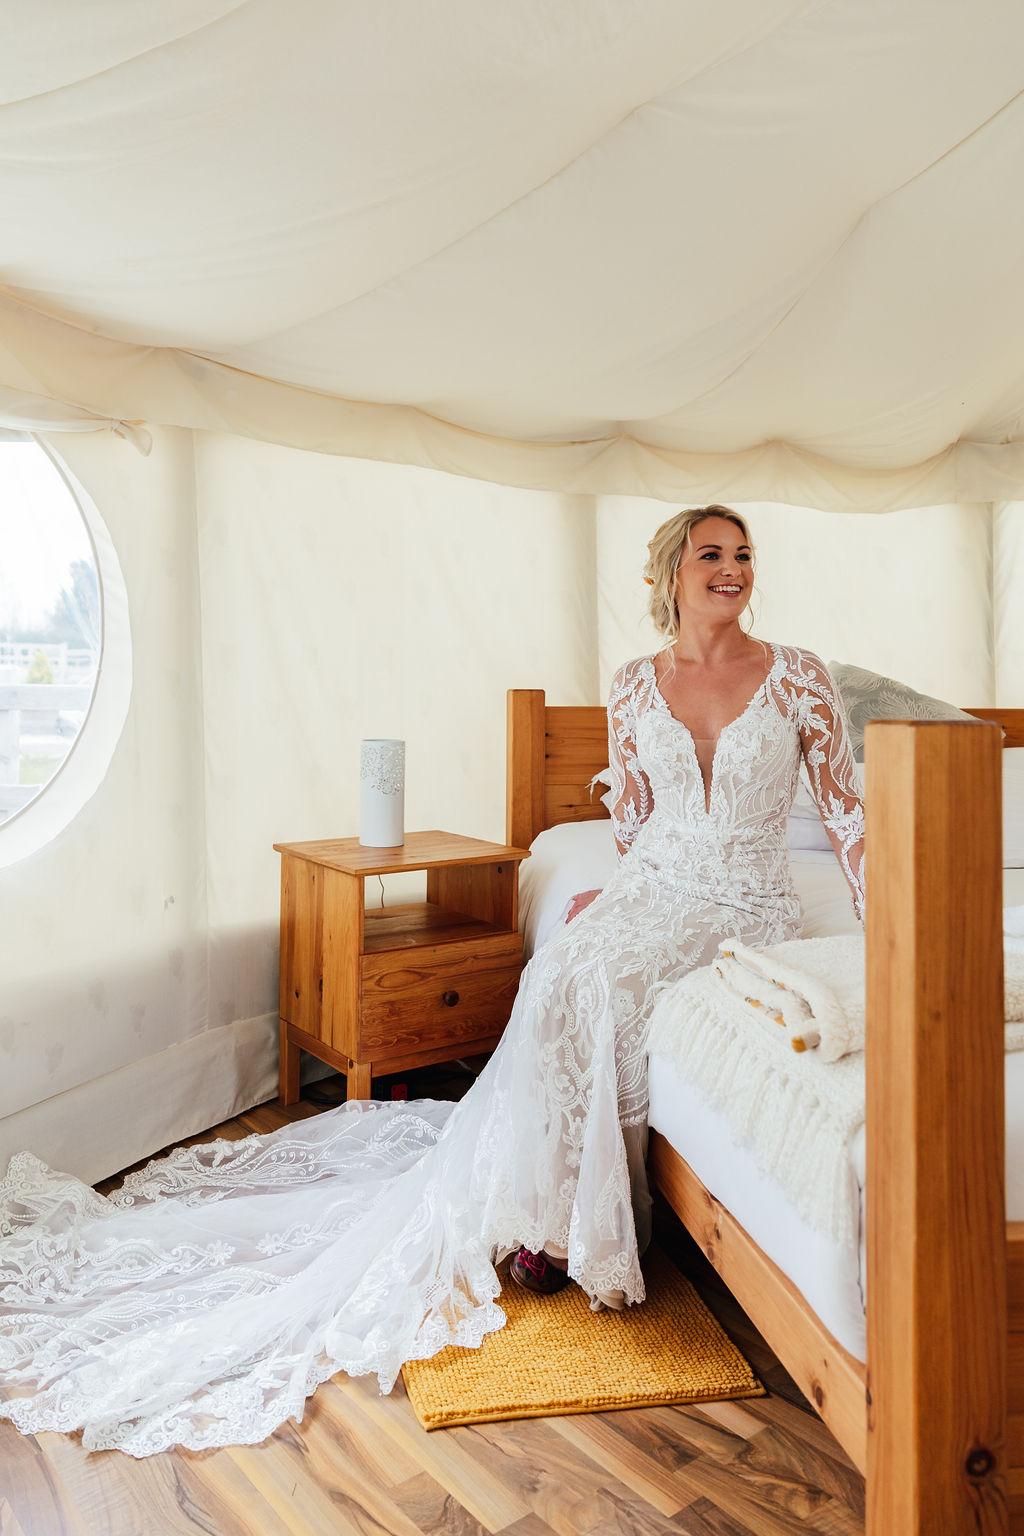 festival wedding accommodation - luxury wedding yurt - unique wedding venue in nottinghamshire